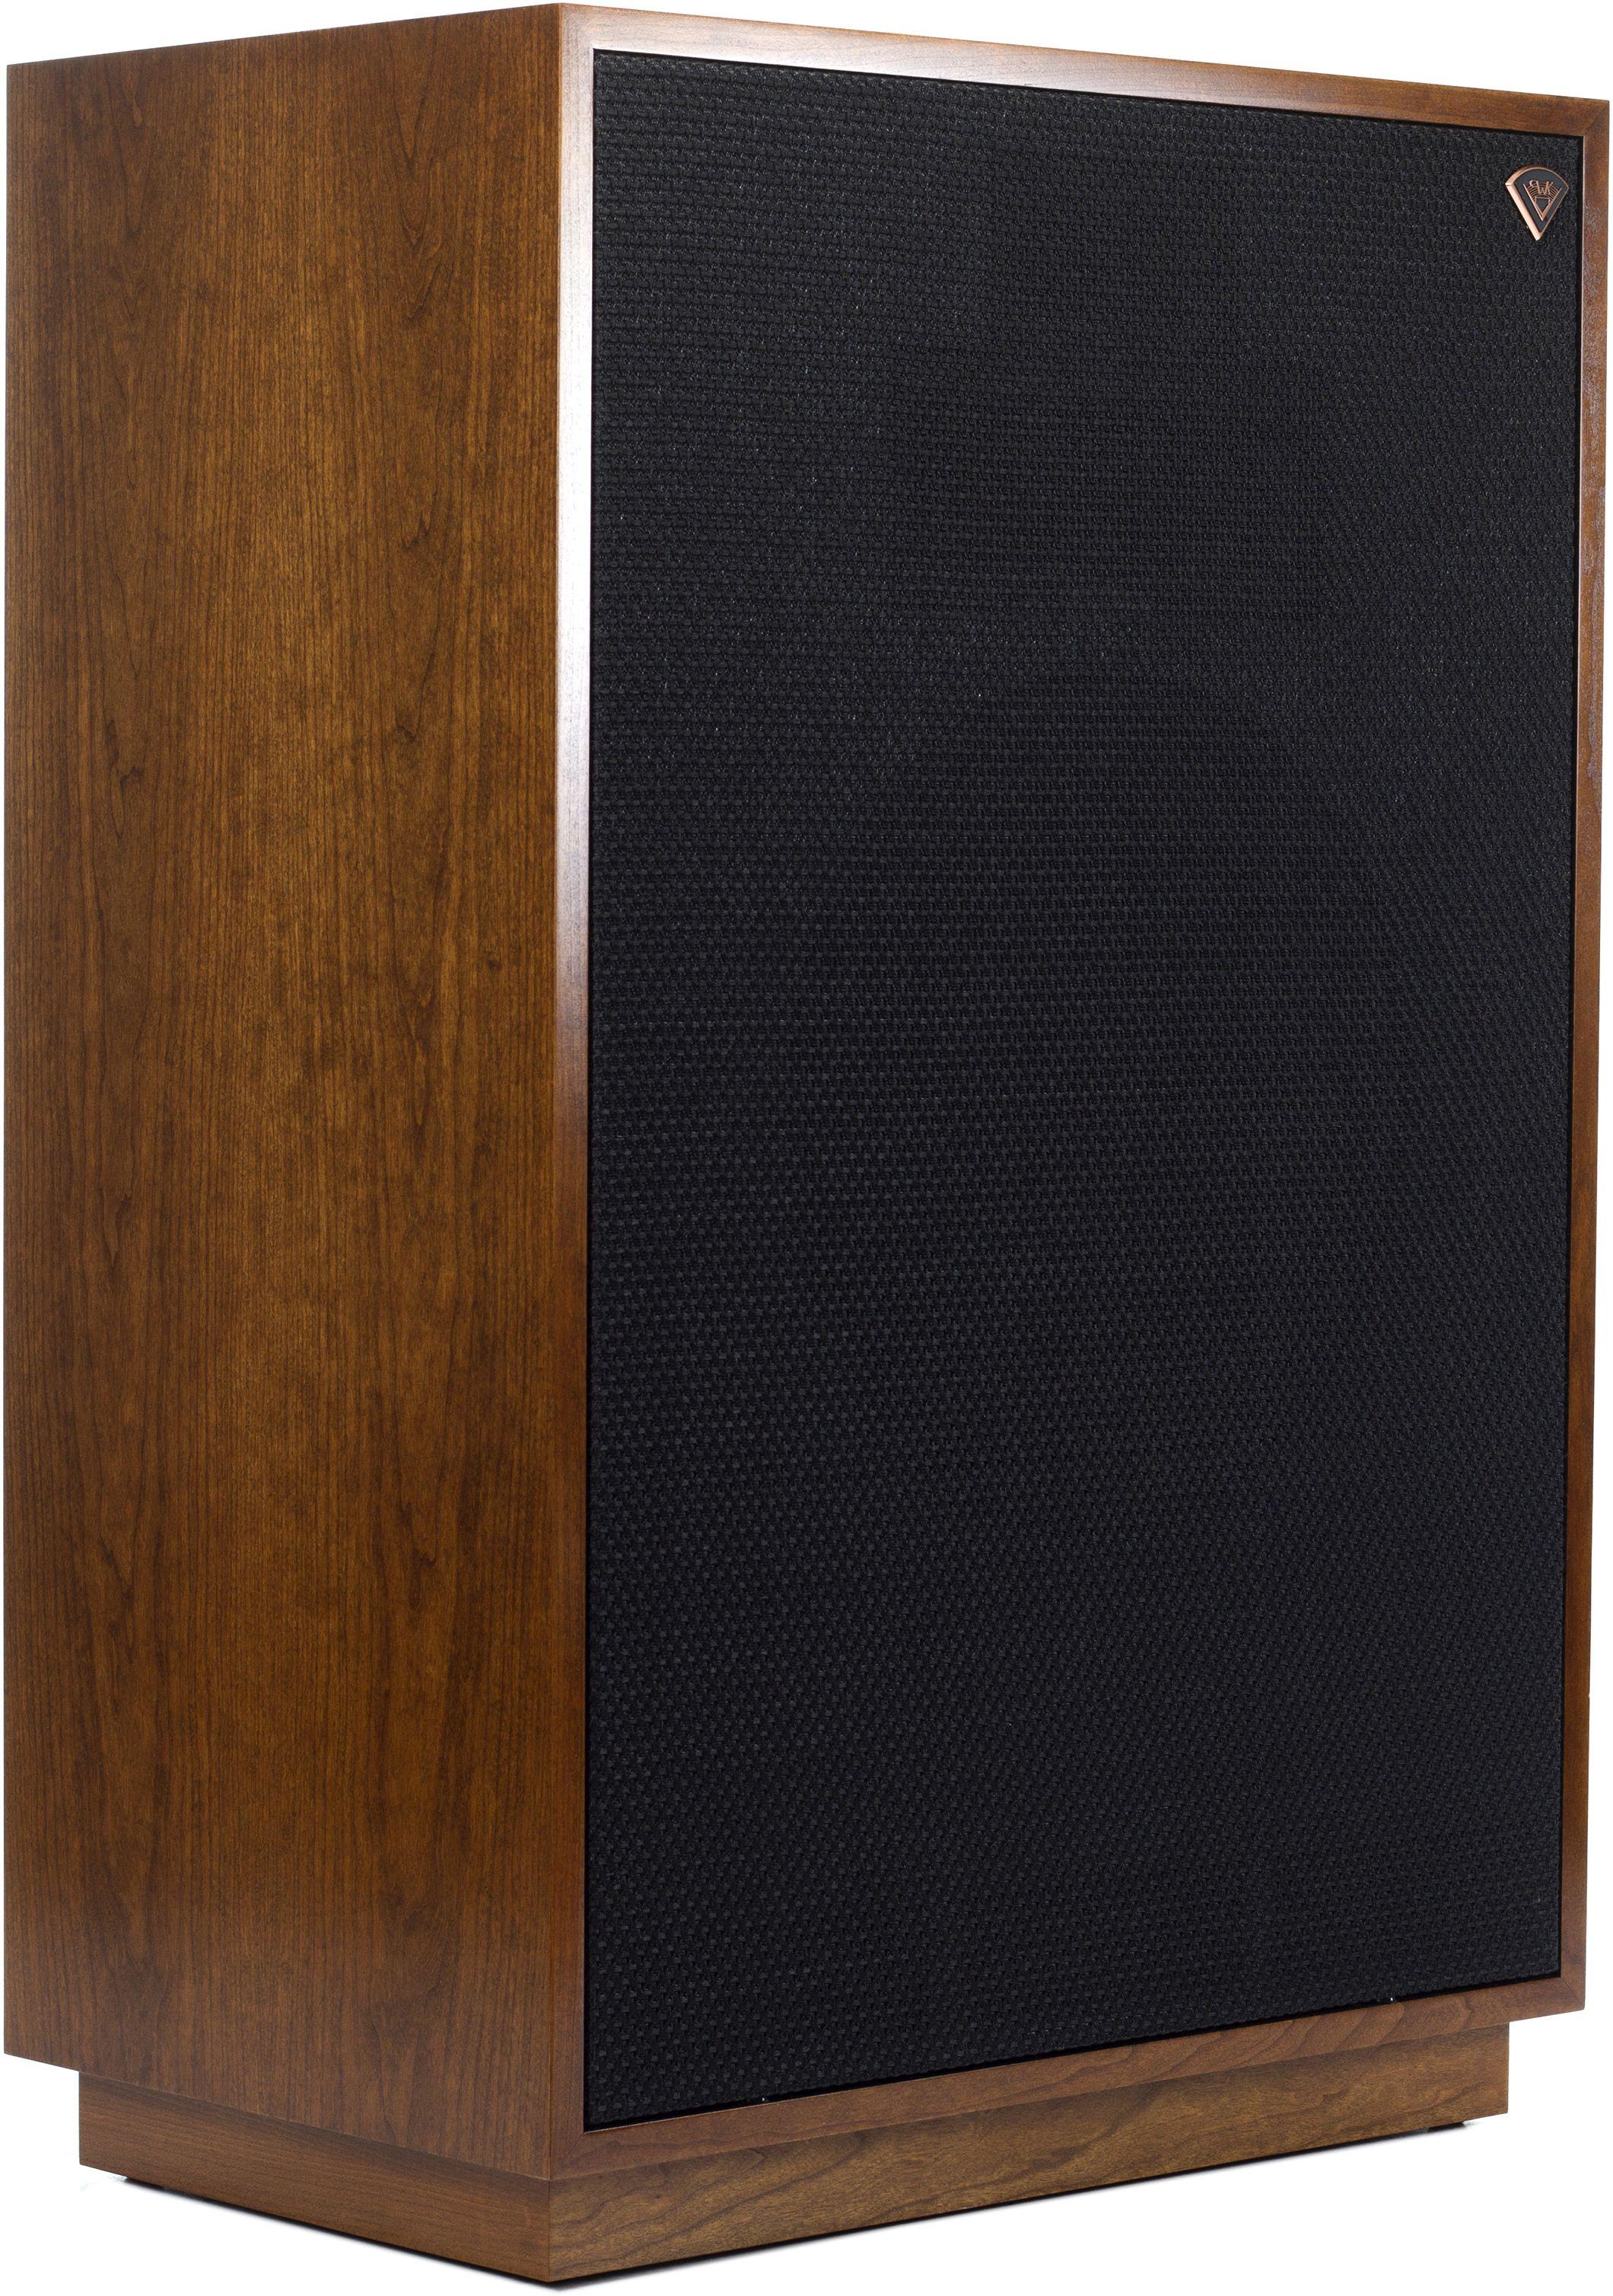 hifi speaker klipsch premiere floors loudspeaker reference gloss black components floor speakers rp standing piano back